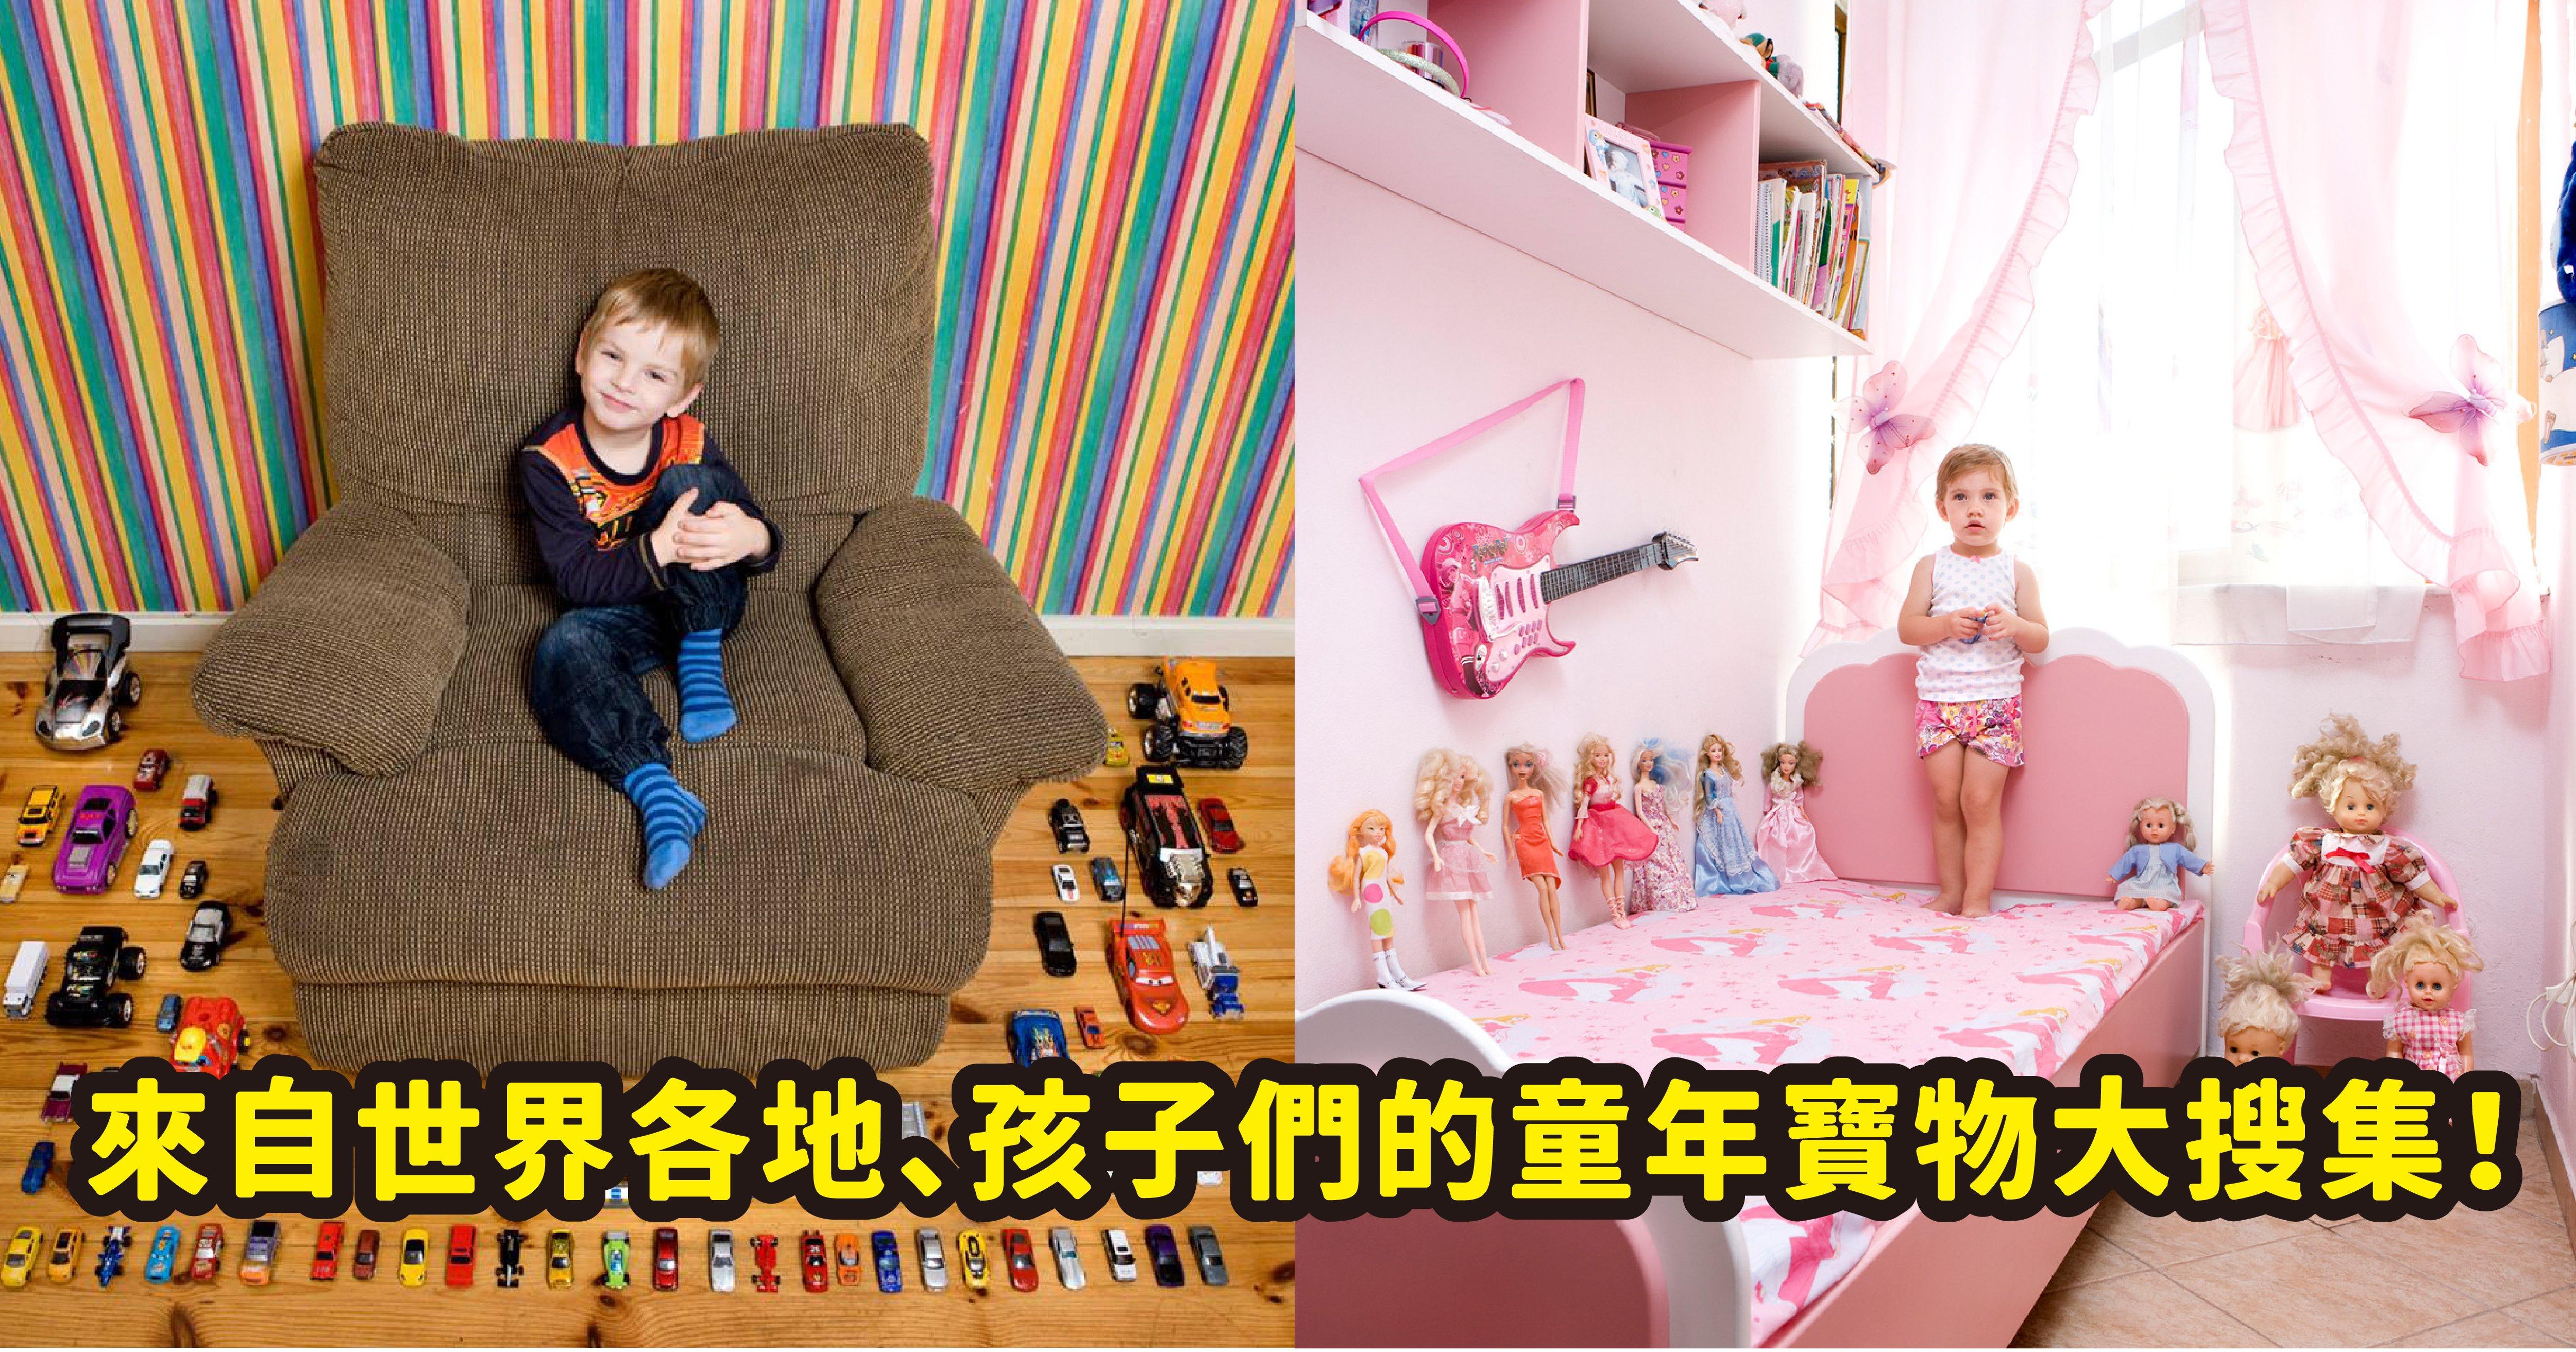 vonvone5b081e99da2 e7aba5e5b9b4 01.png?resize=1200,630 - 世界各地的孩子童年玩什麼?不同國家的孩子的童年寶物原來這麼不一樣!